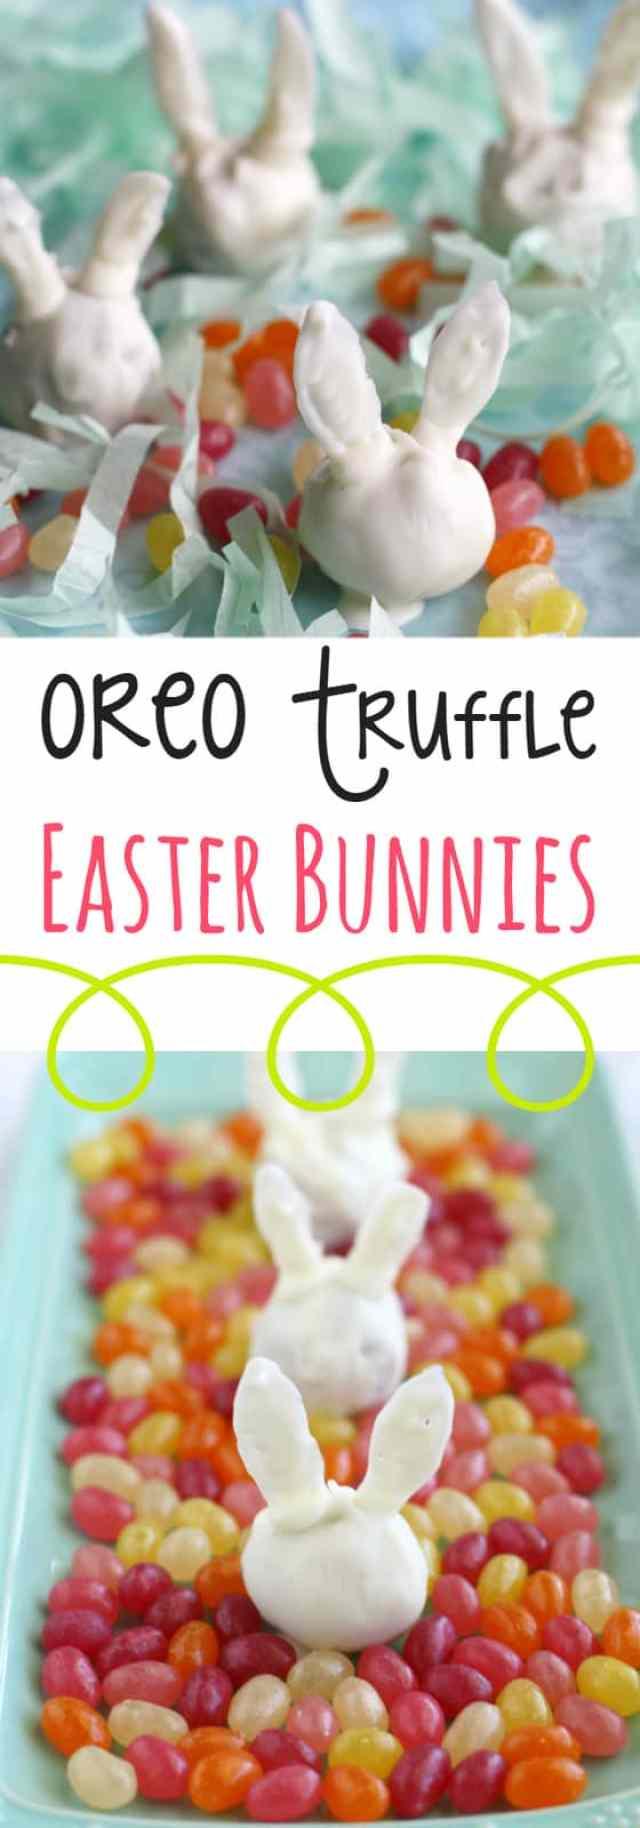 oreo truffle easter bunnies